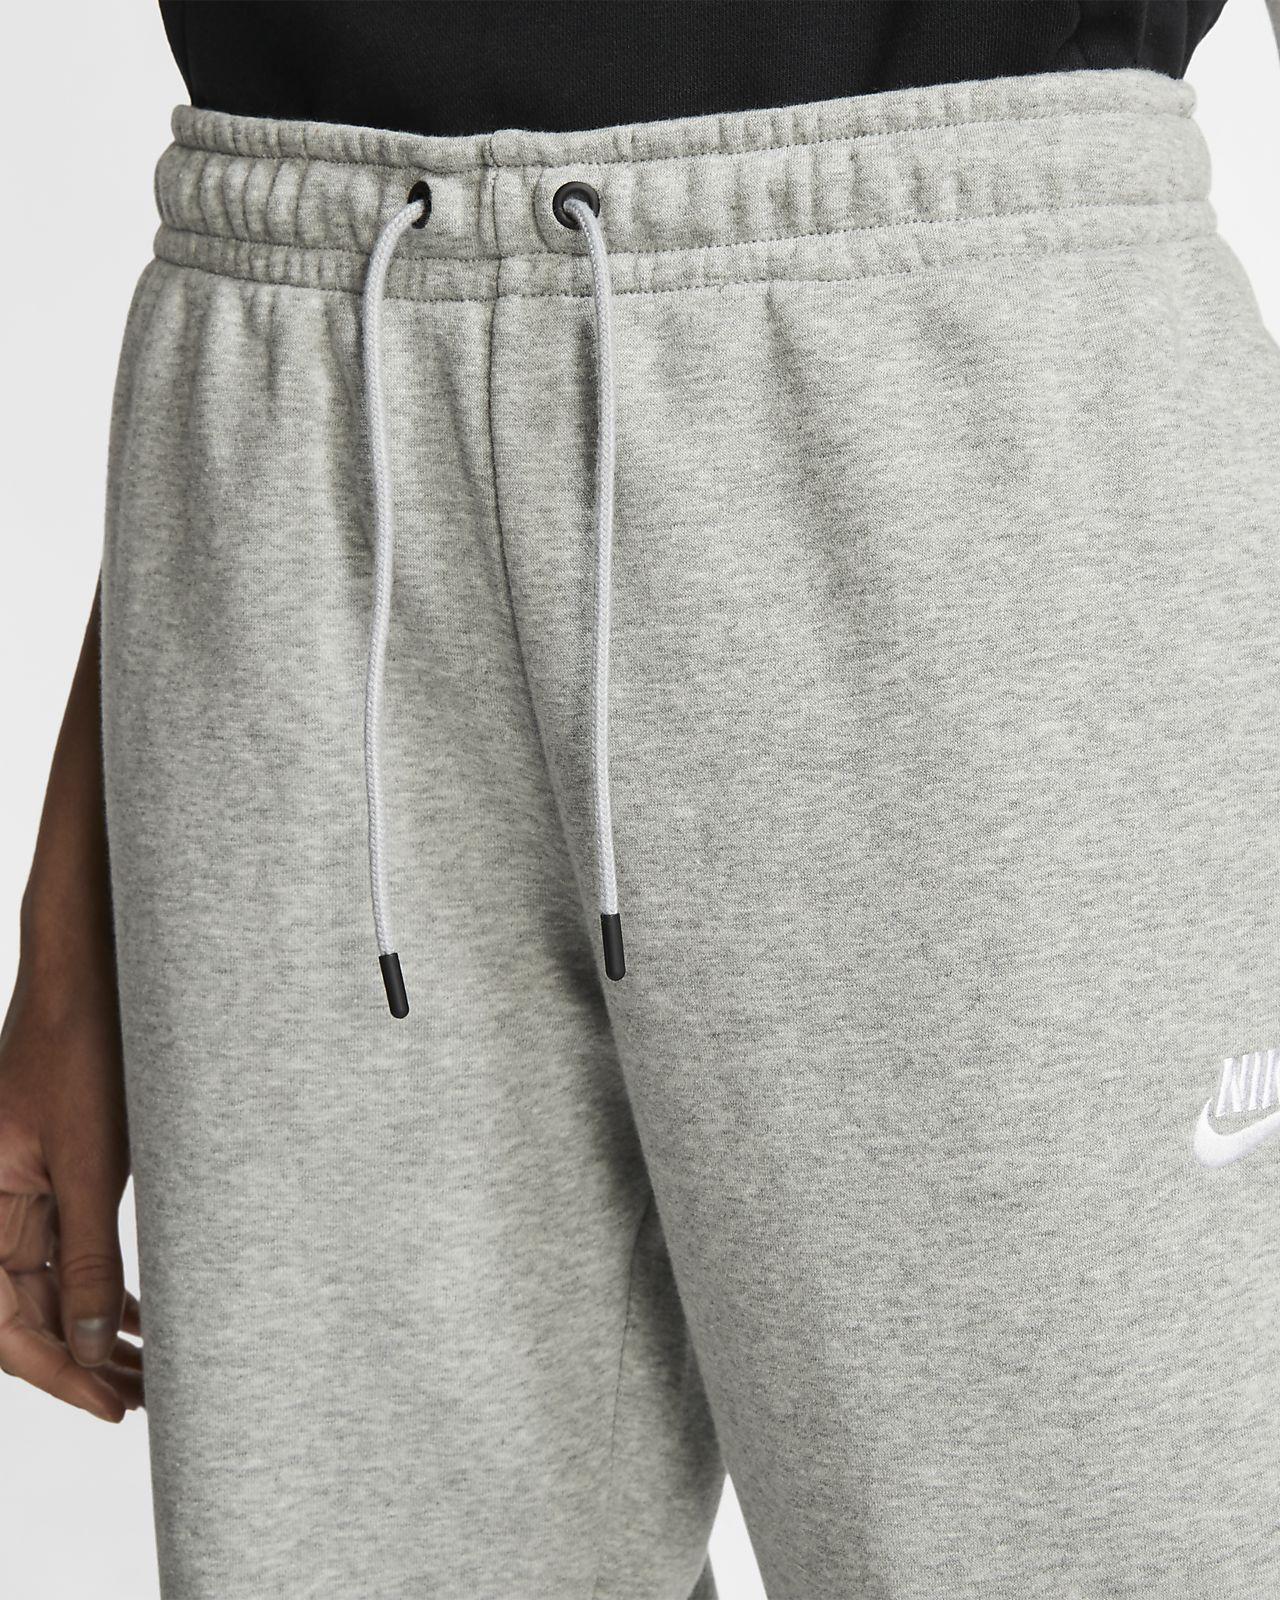 sweatpant shorts women